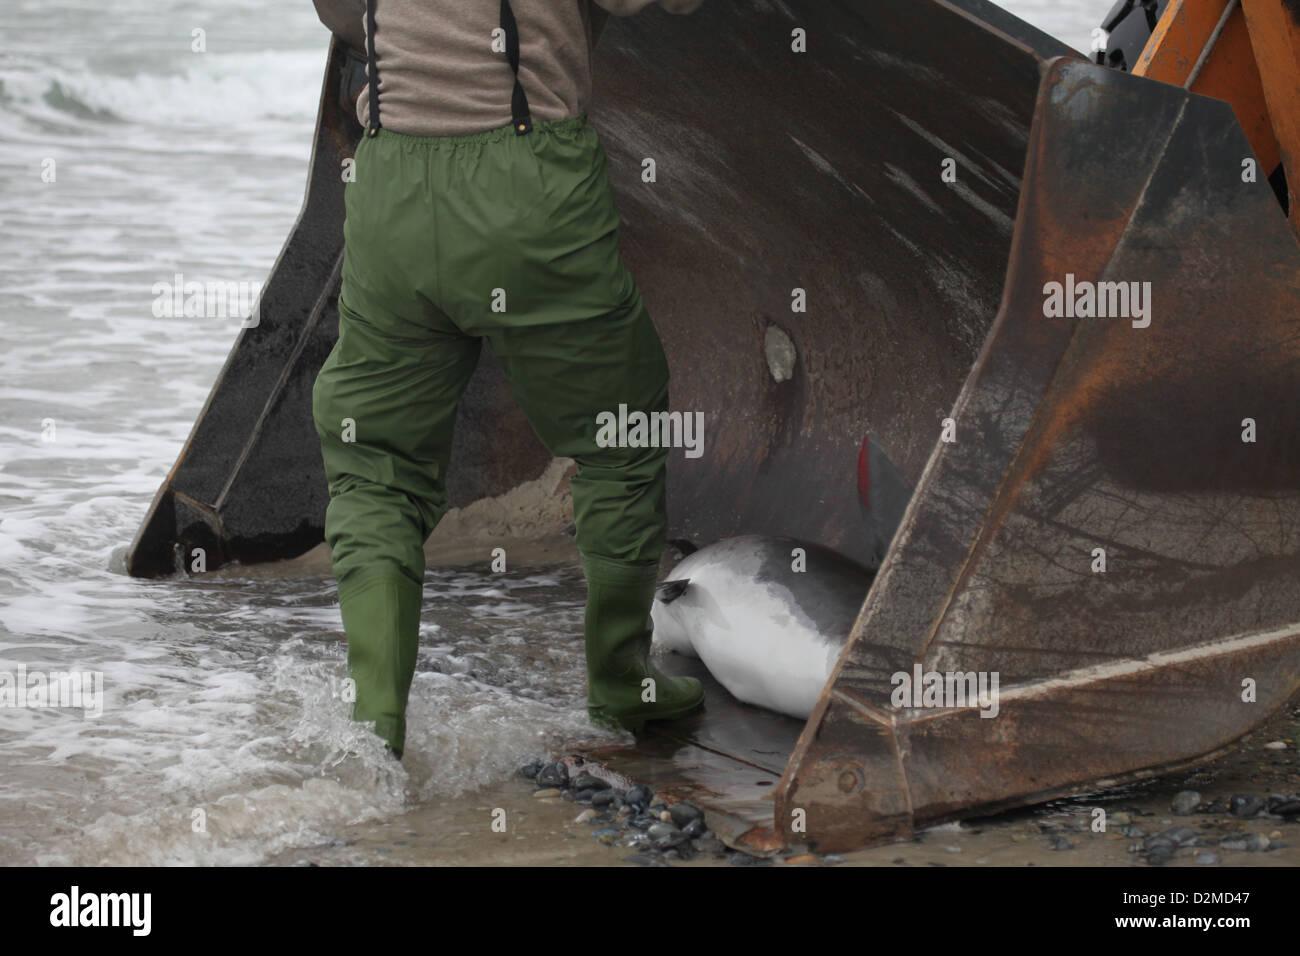 A life-stranding of a juvenile harbour porpoise, Phocoena phocoena, Helgoland, North Sea - Stock Image